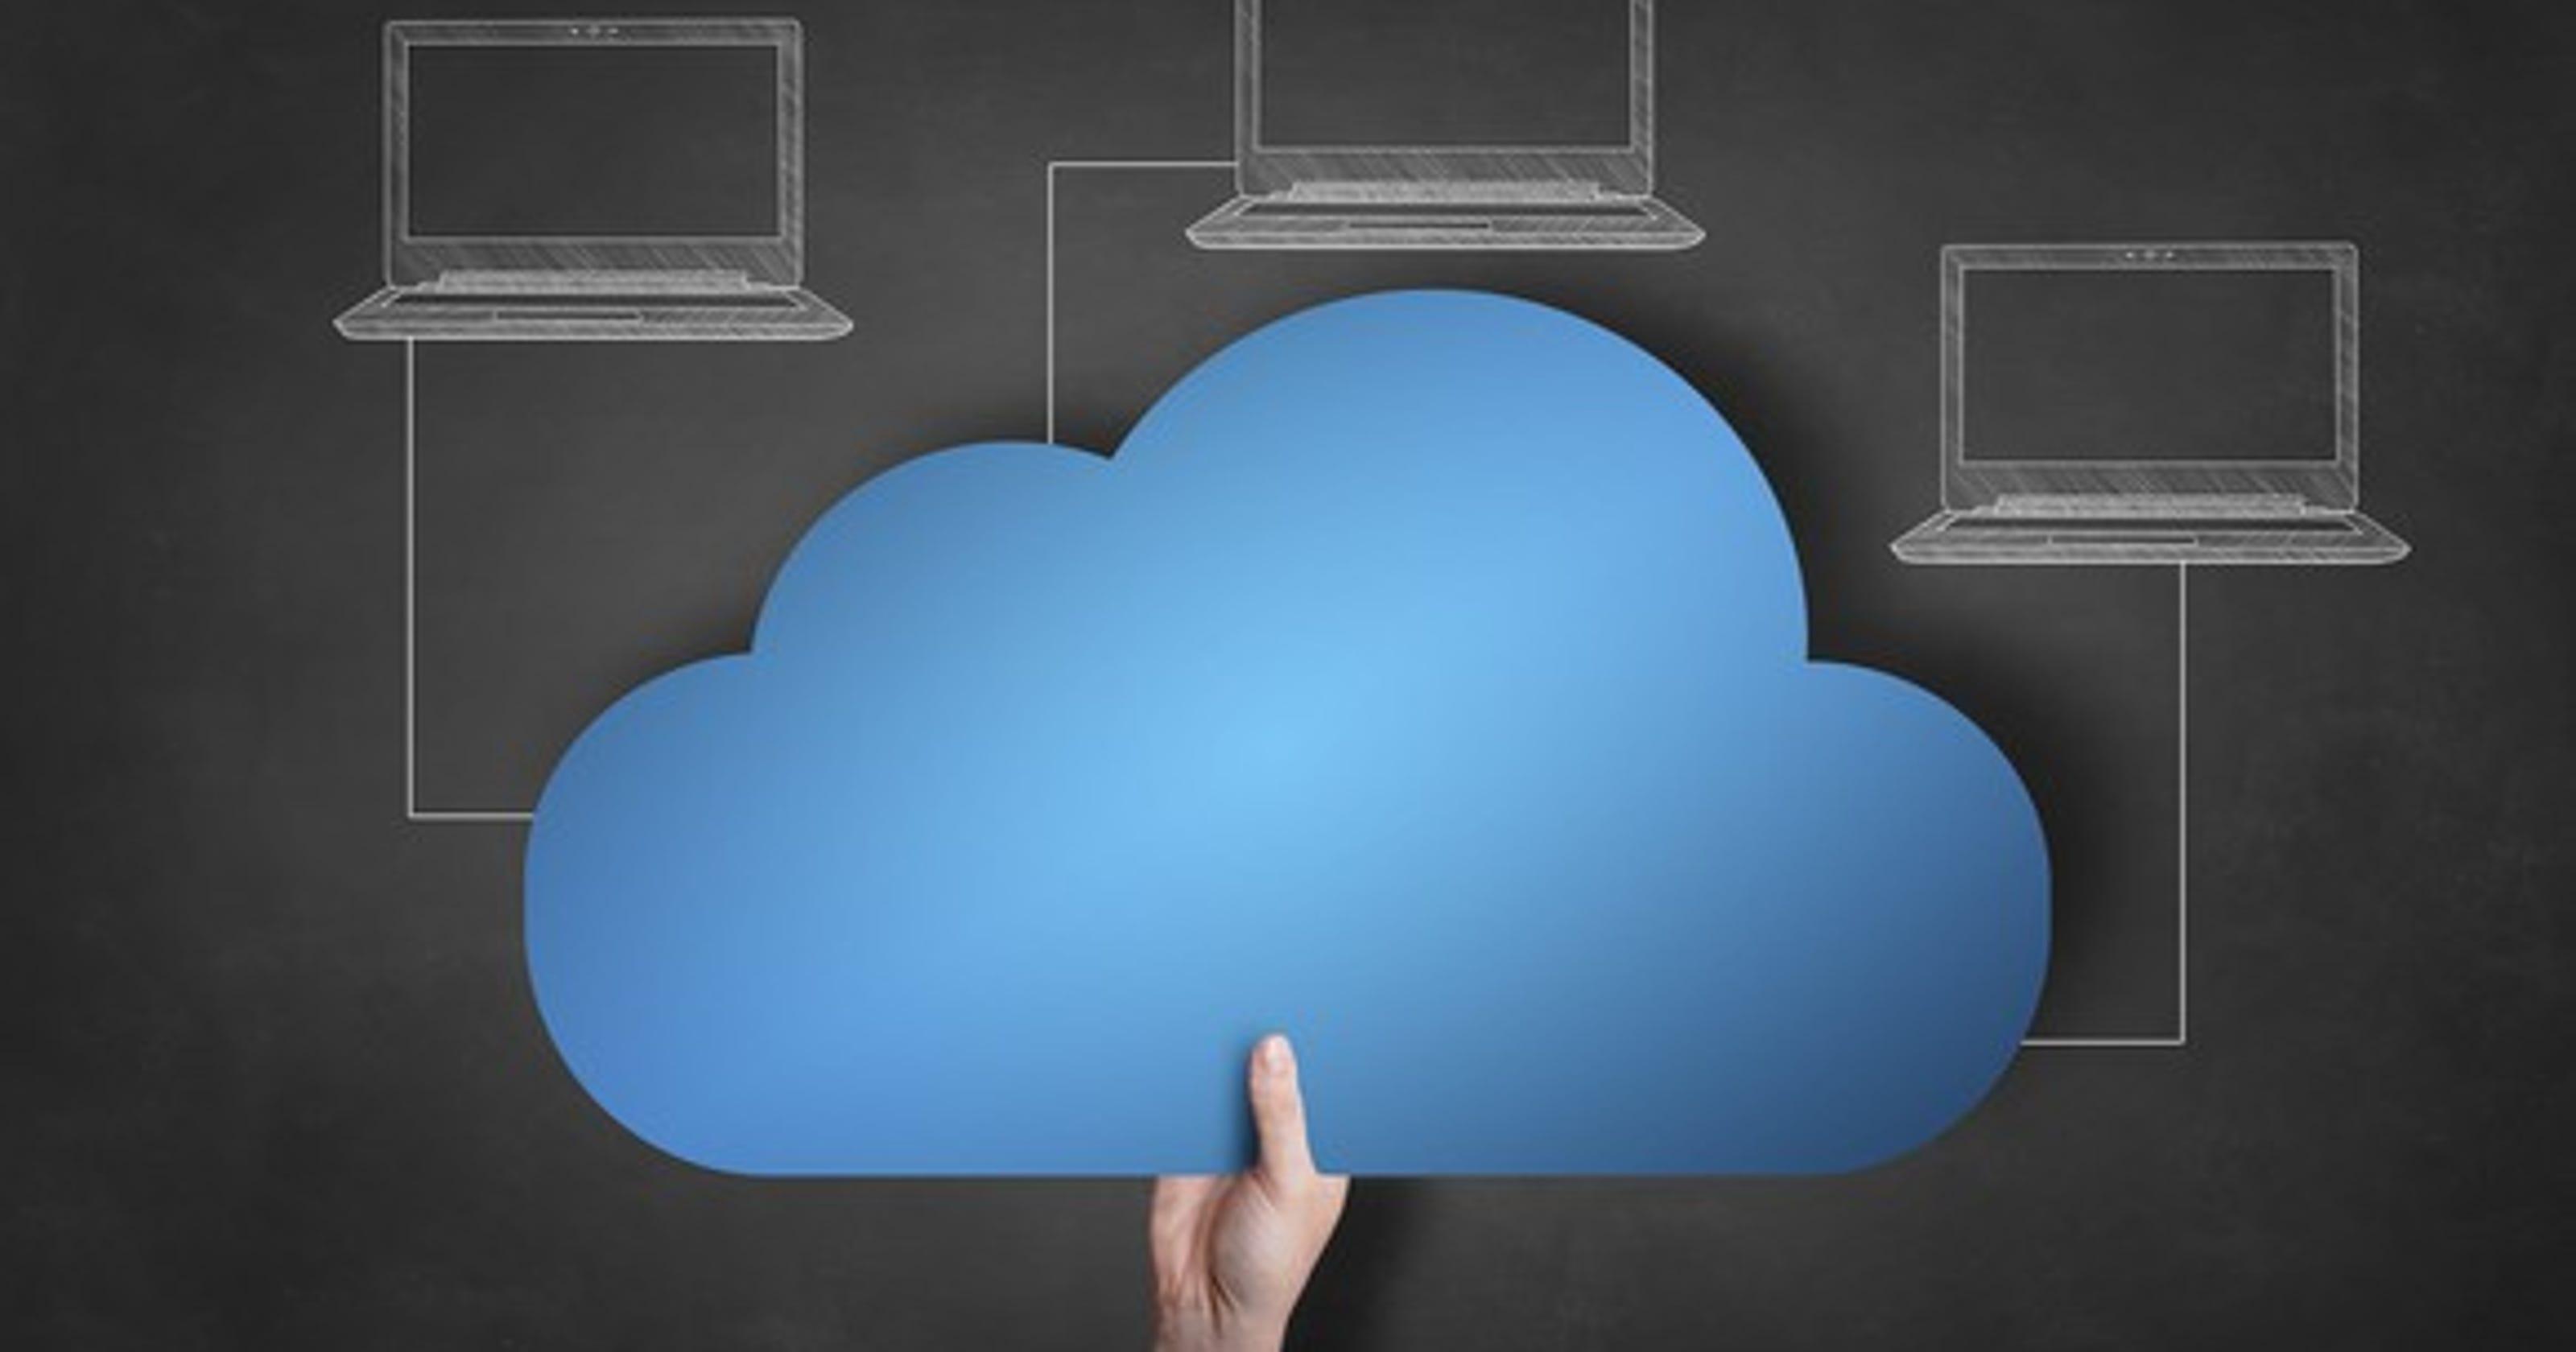 Dropbox IPO: Cloud storage lures investors but its deal isn't best